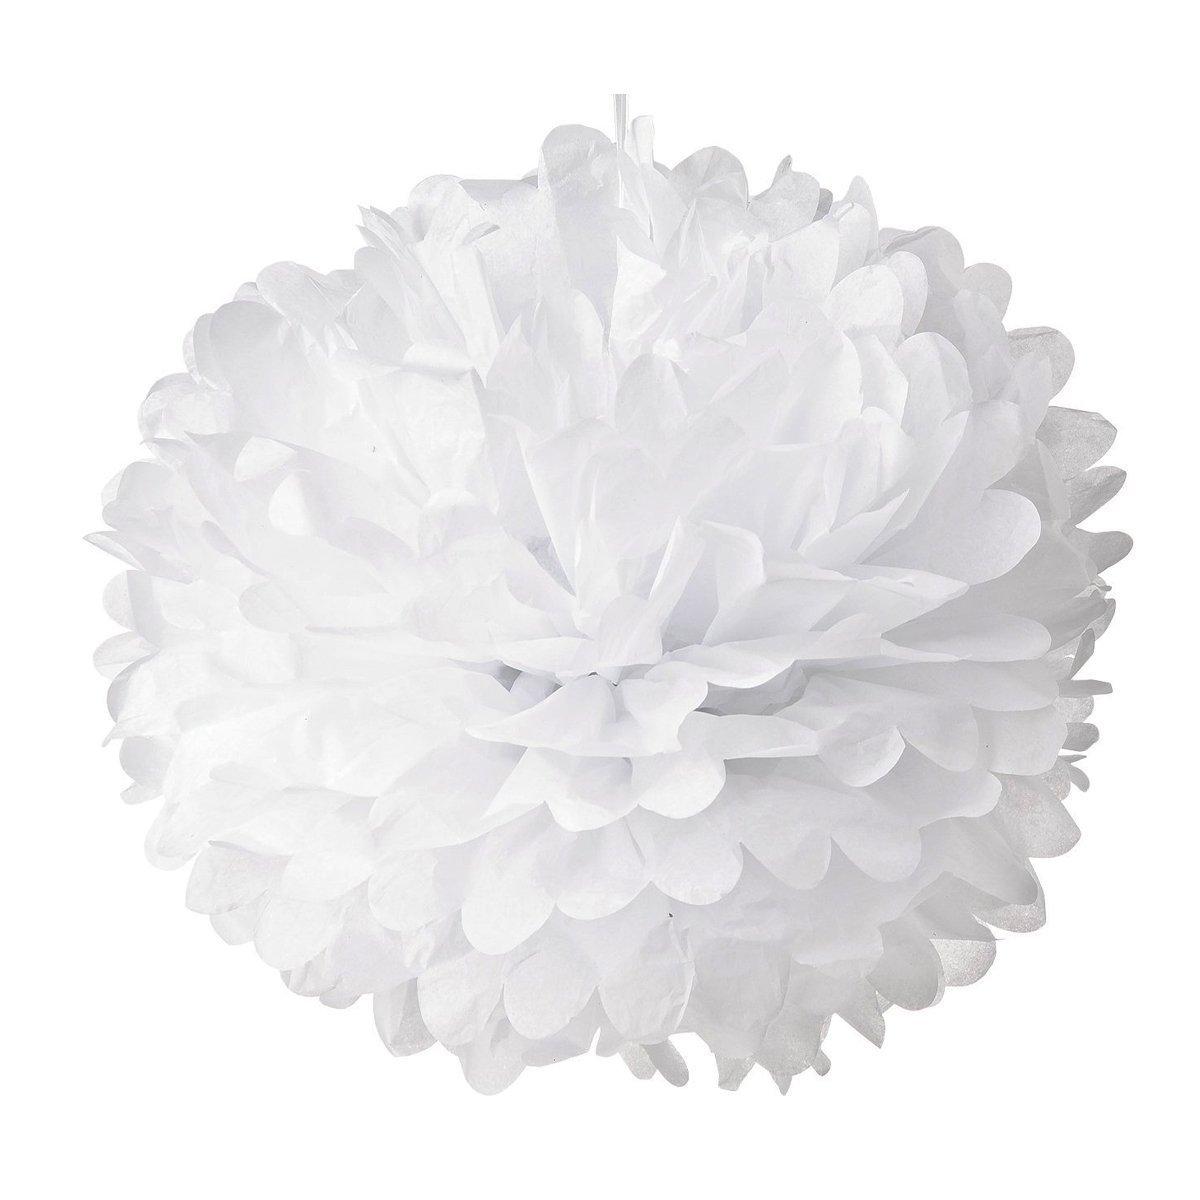 tissue paper puff